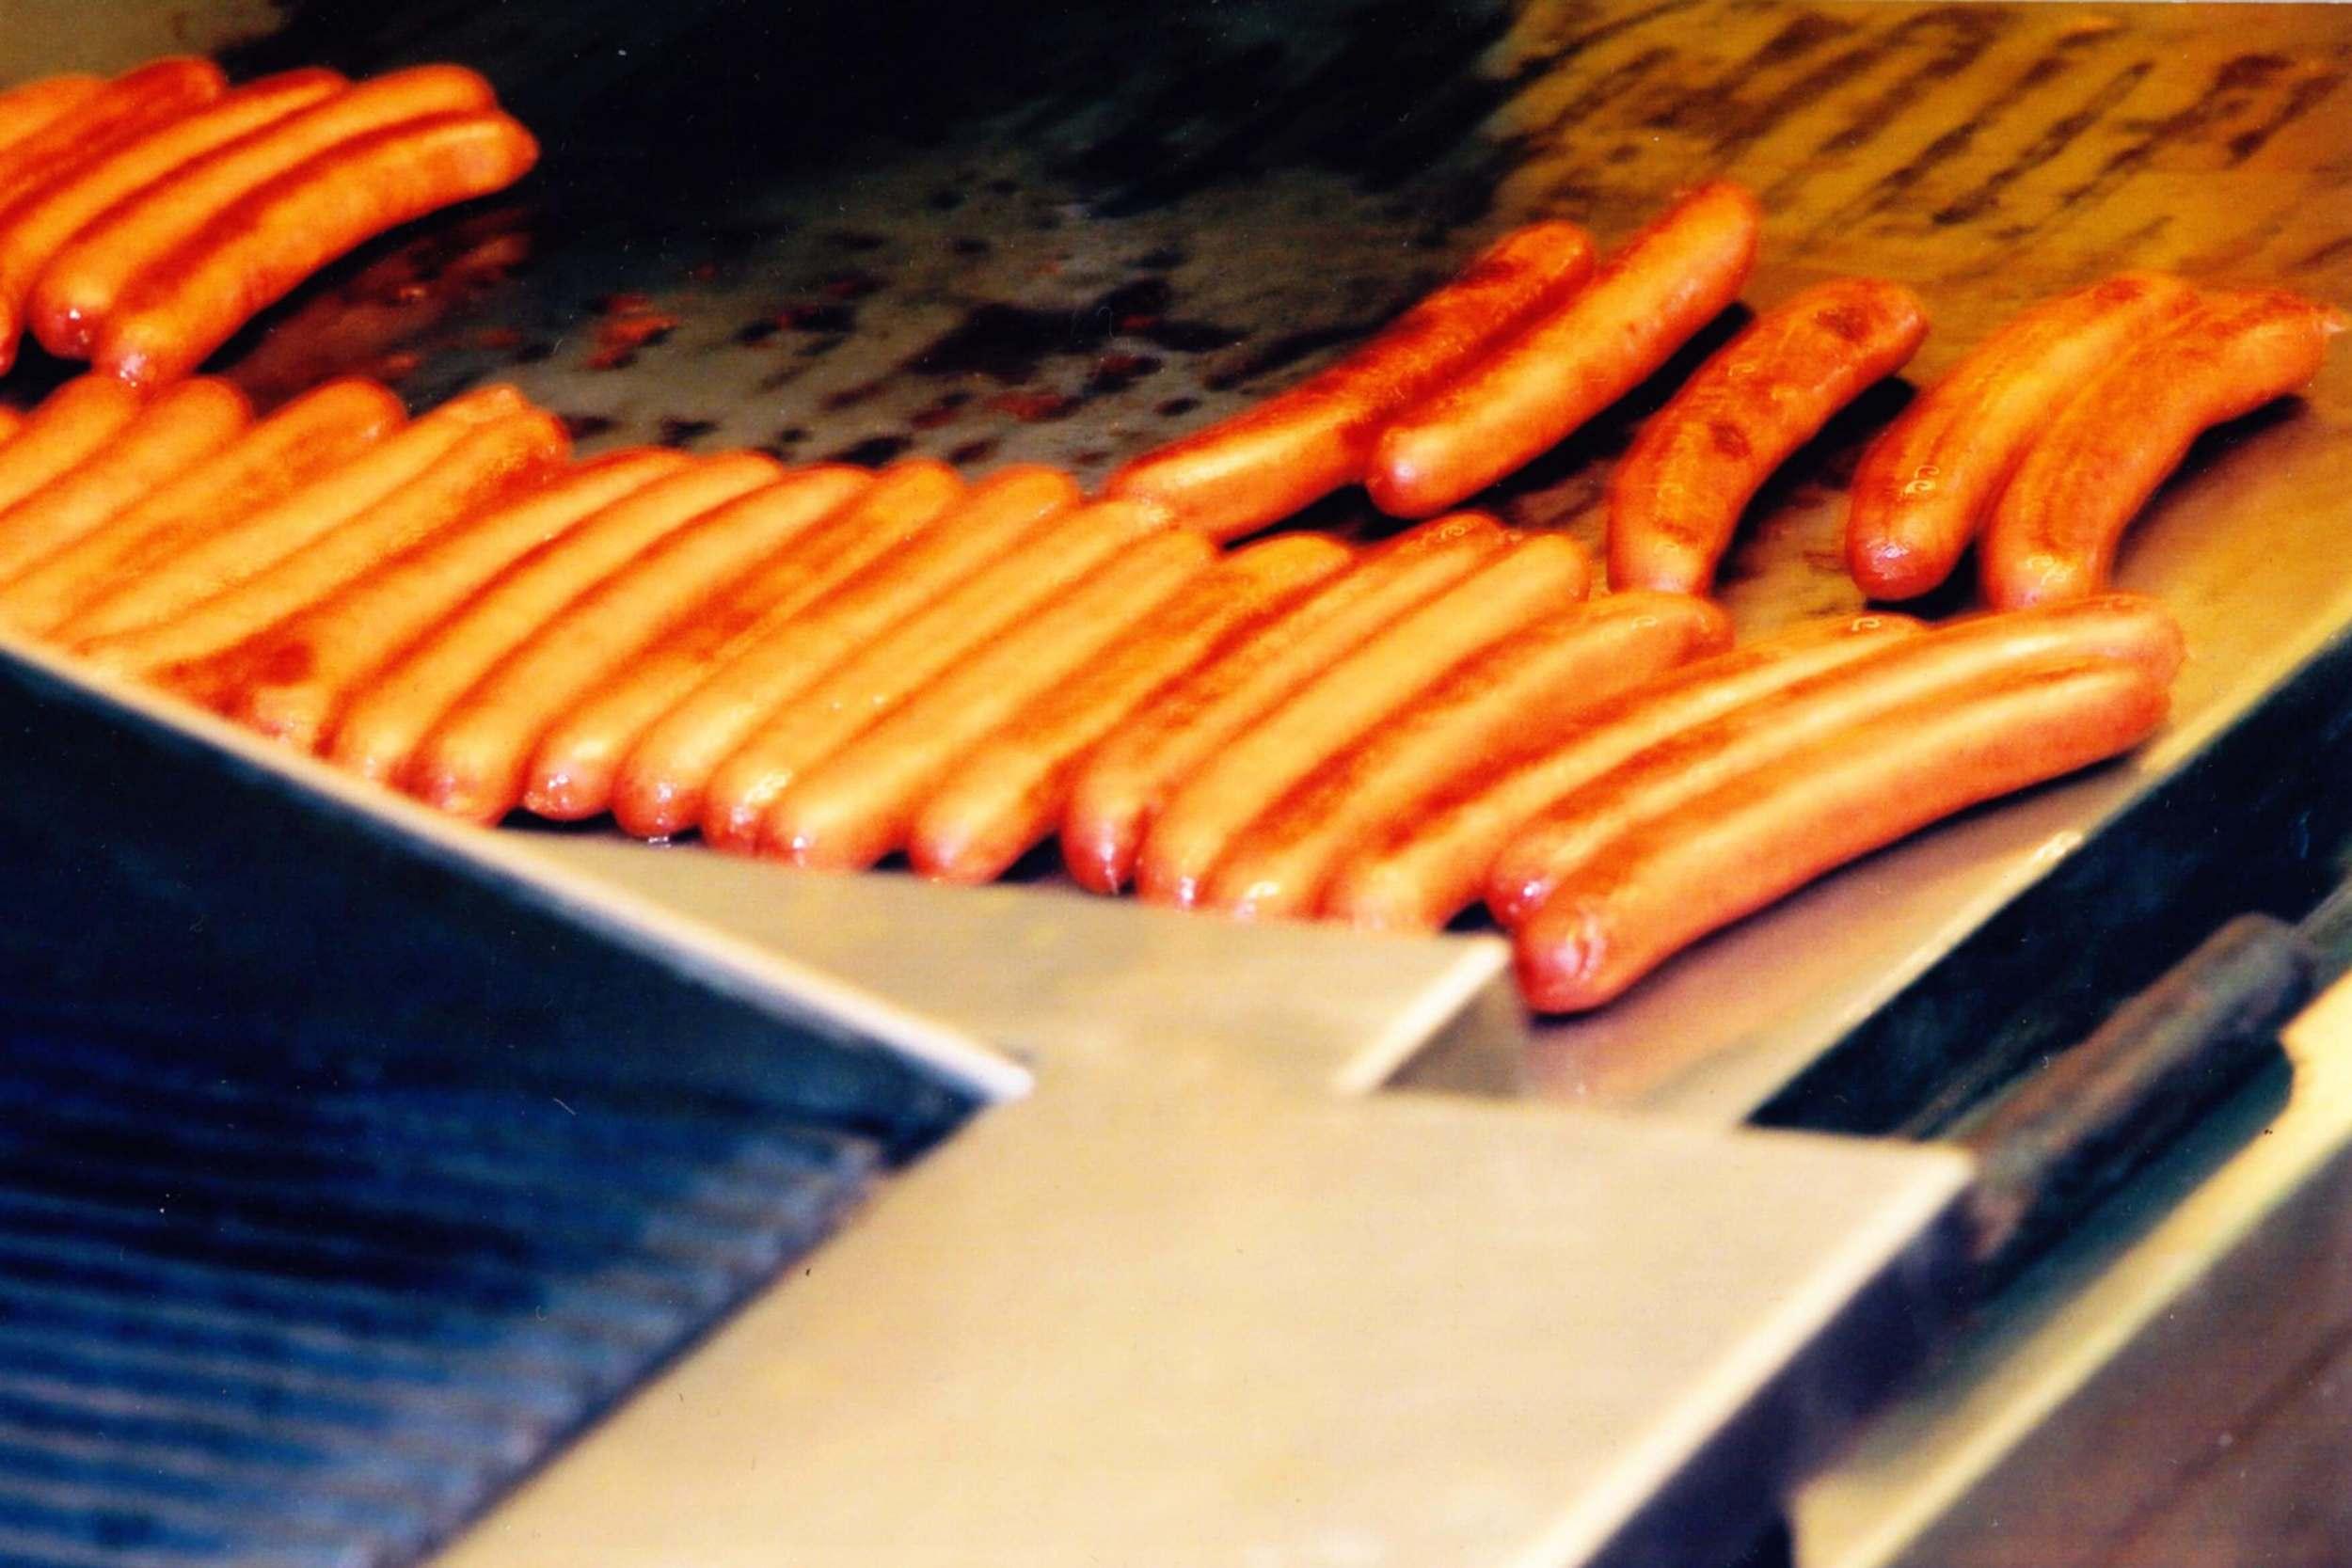 Seaport_Hotdogs.jpg